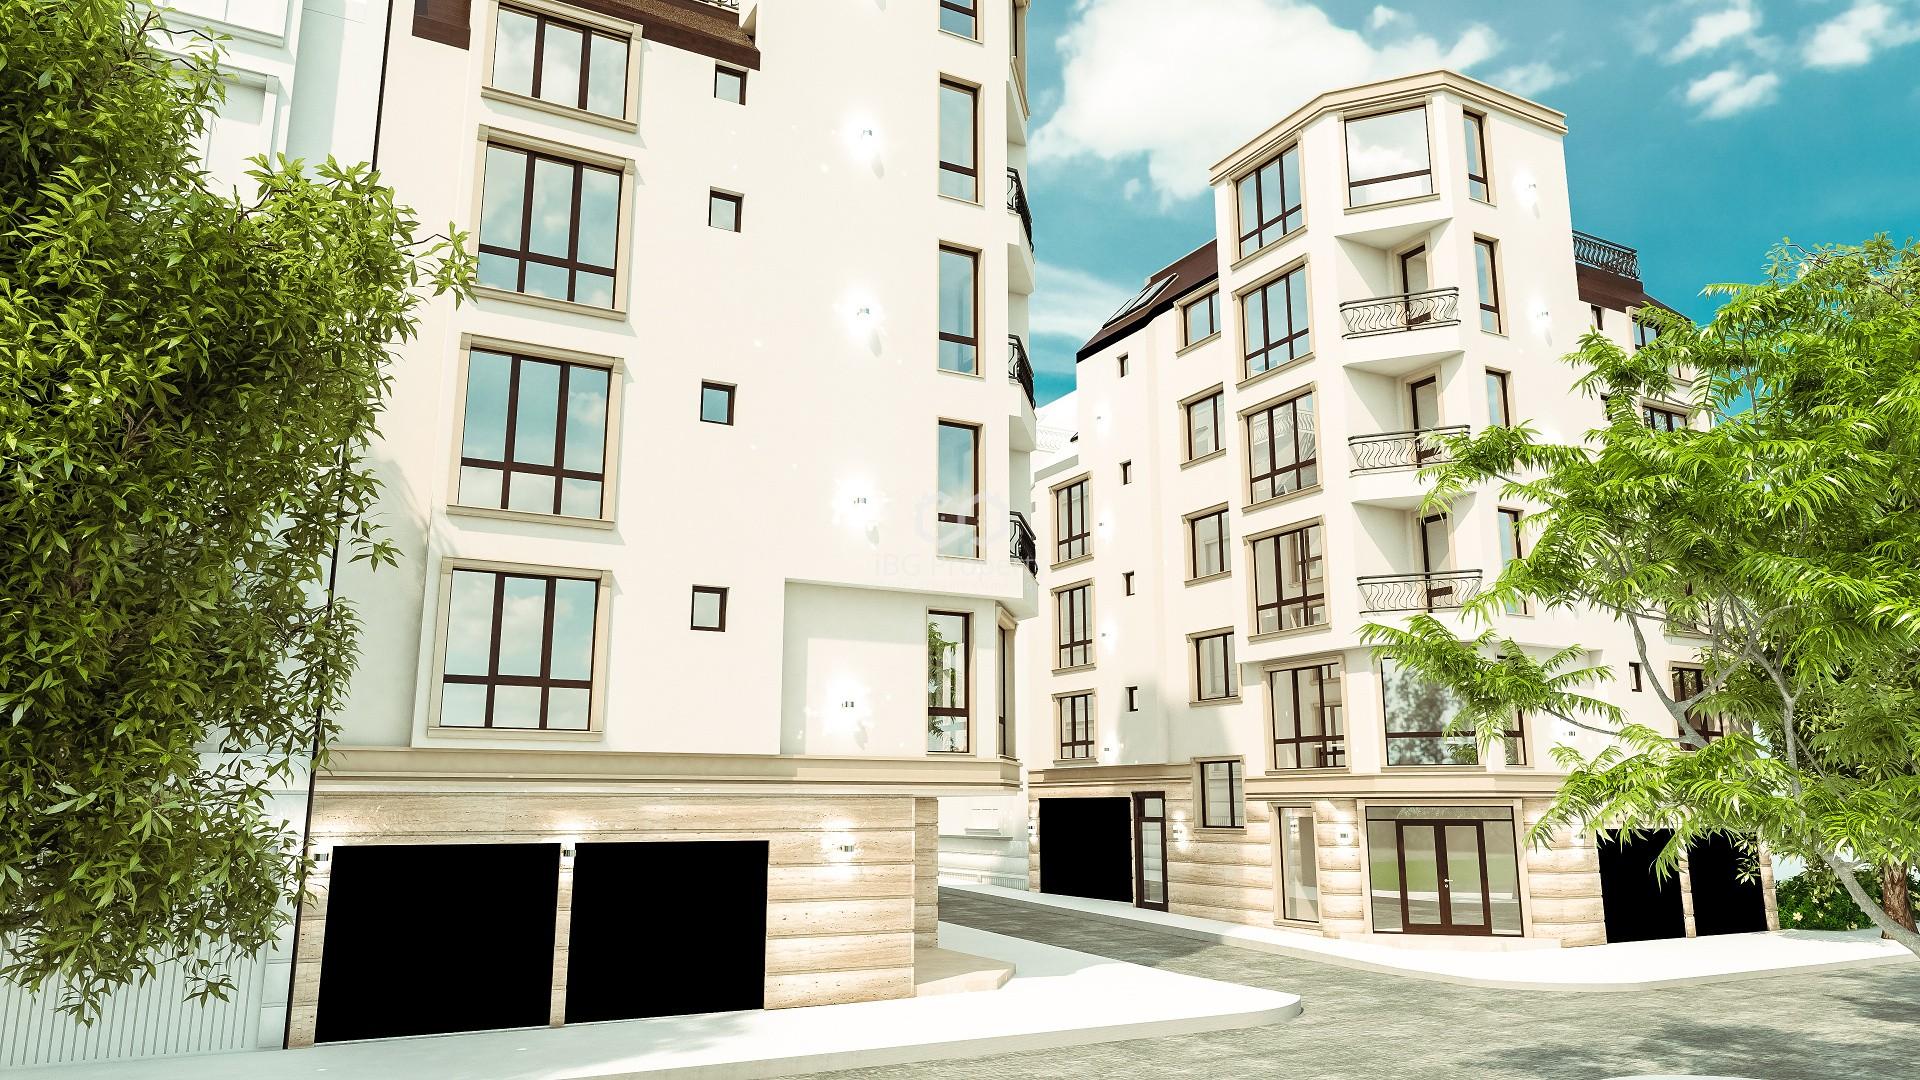 Dreizimmerwohnung in Kolkhozen Pazar, Varna 72,12 m2